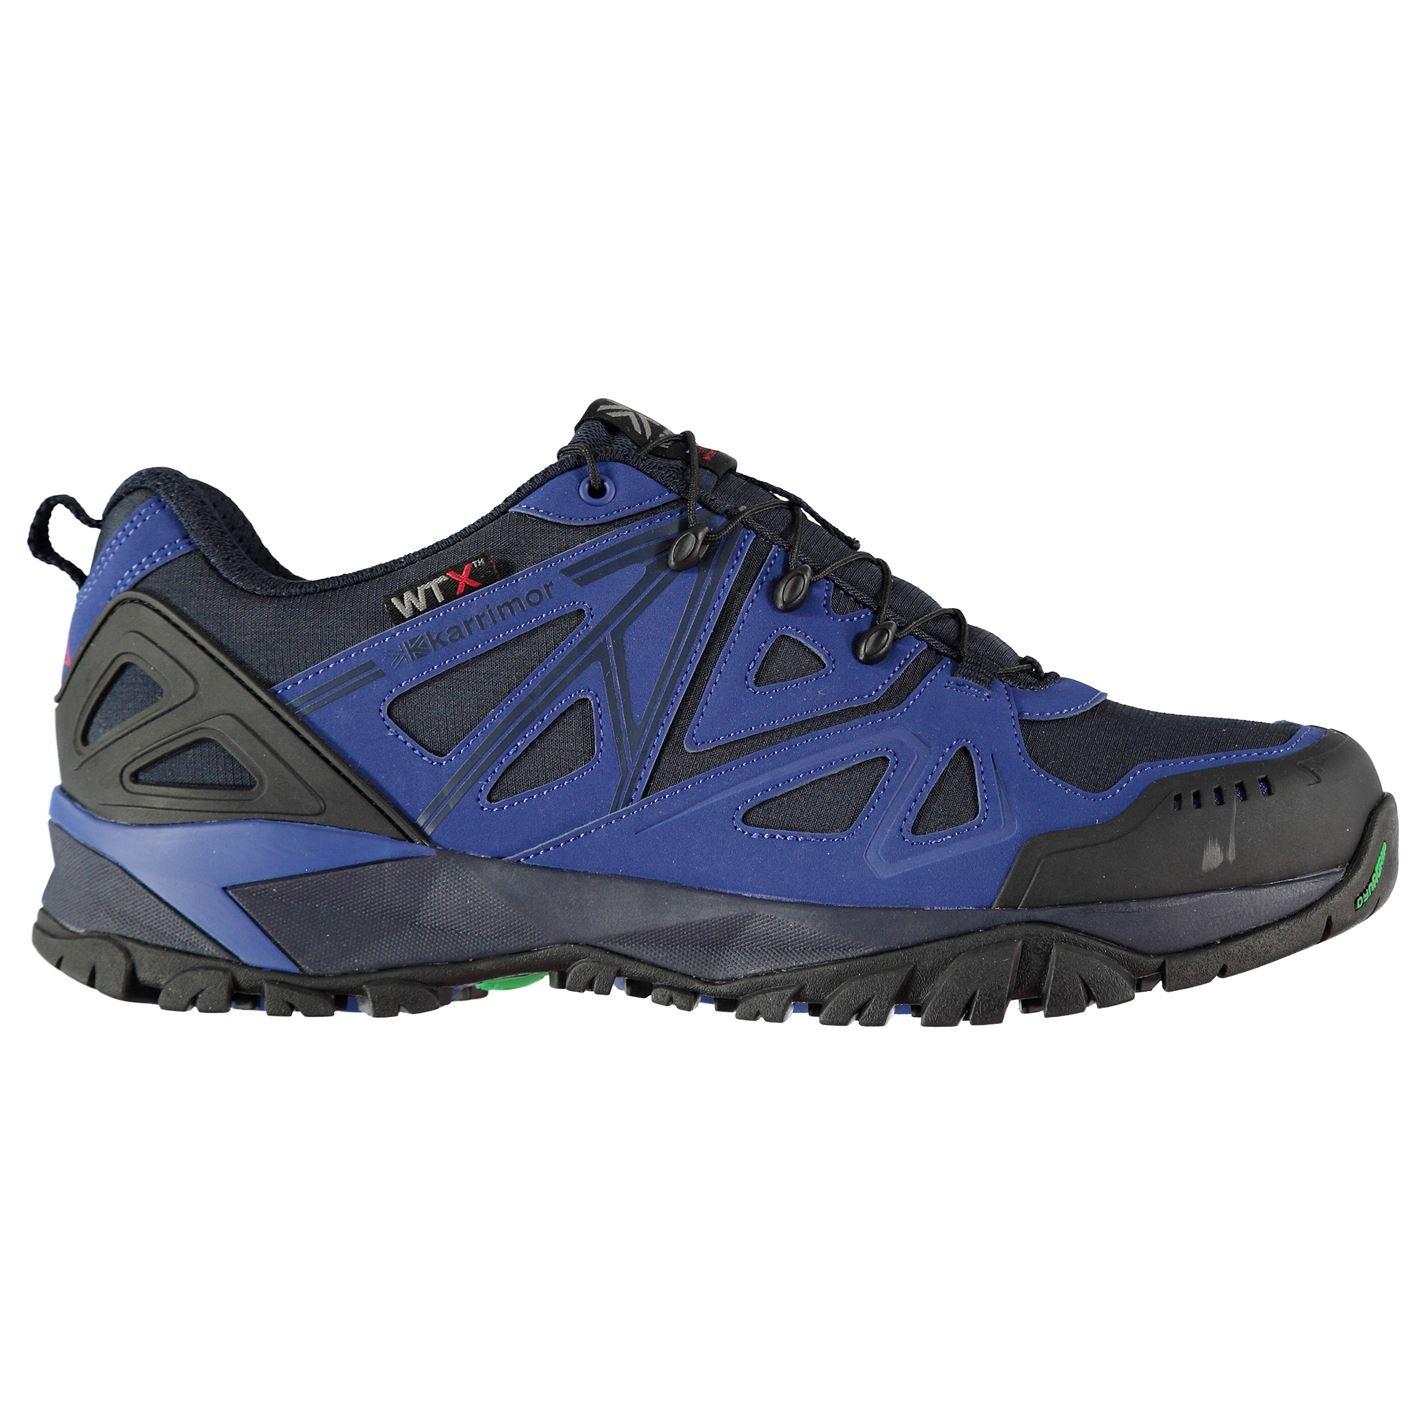 Karrimor Surge WTX Mens Walking Shoes